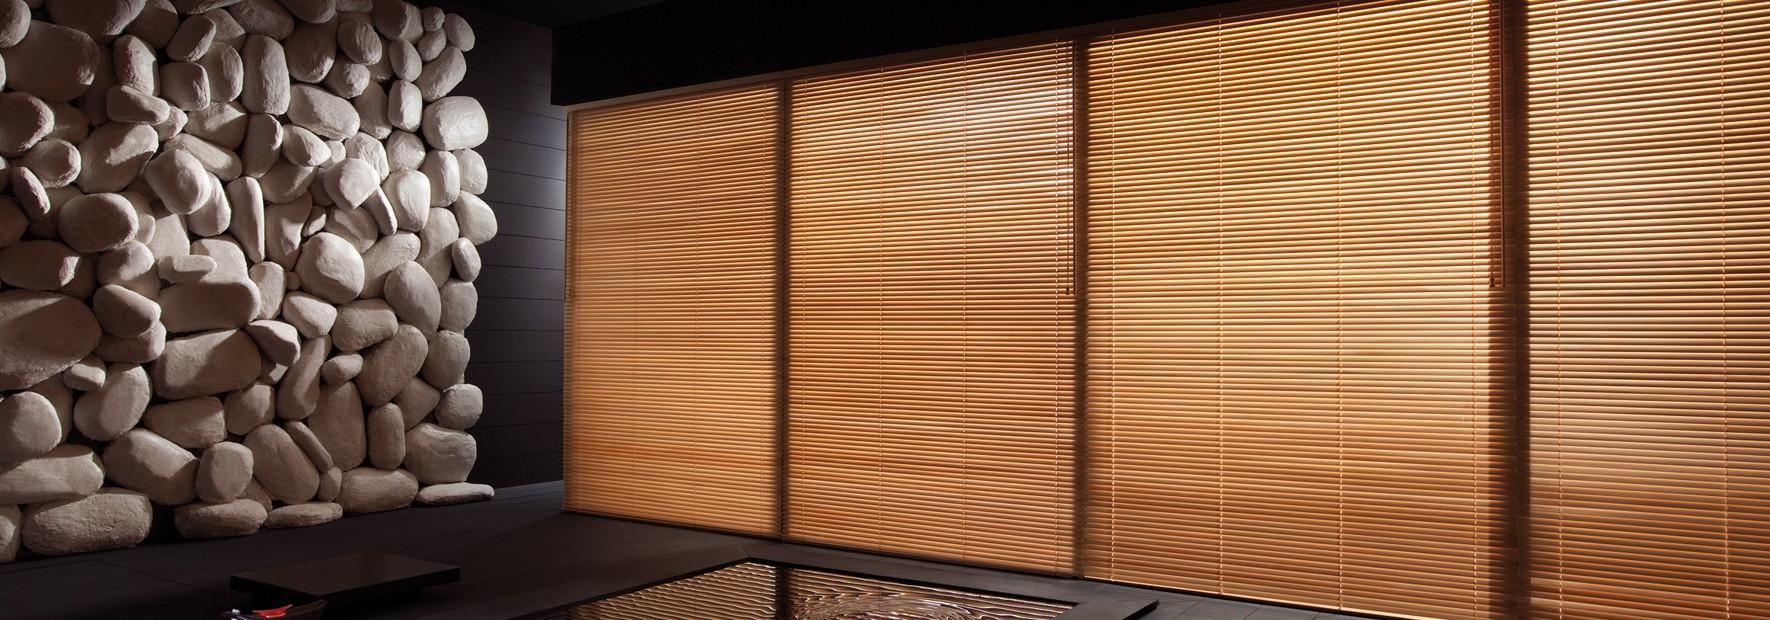 jalousie plissee lamellen rollladen markisen. Black Bedroom Furniture Sets. Home Design Ideas